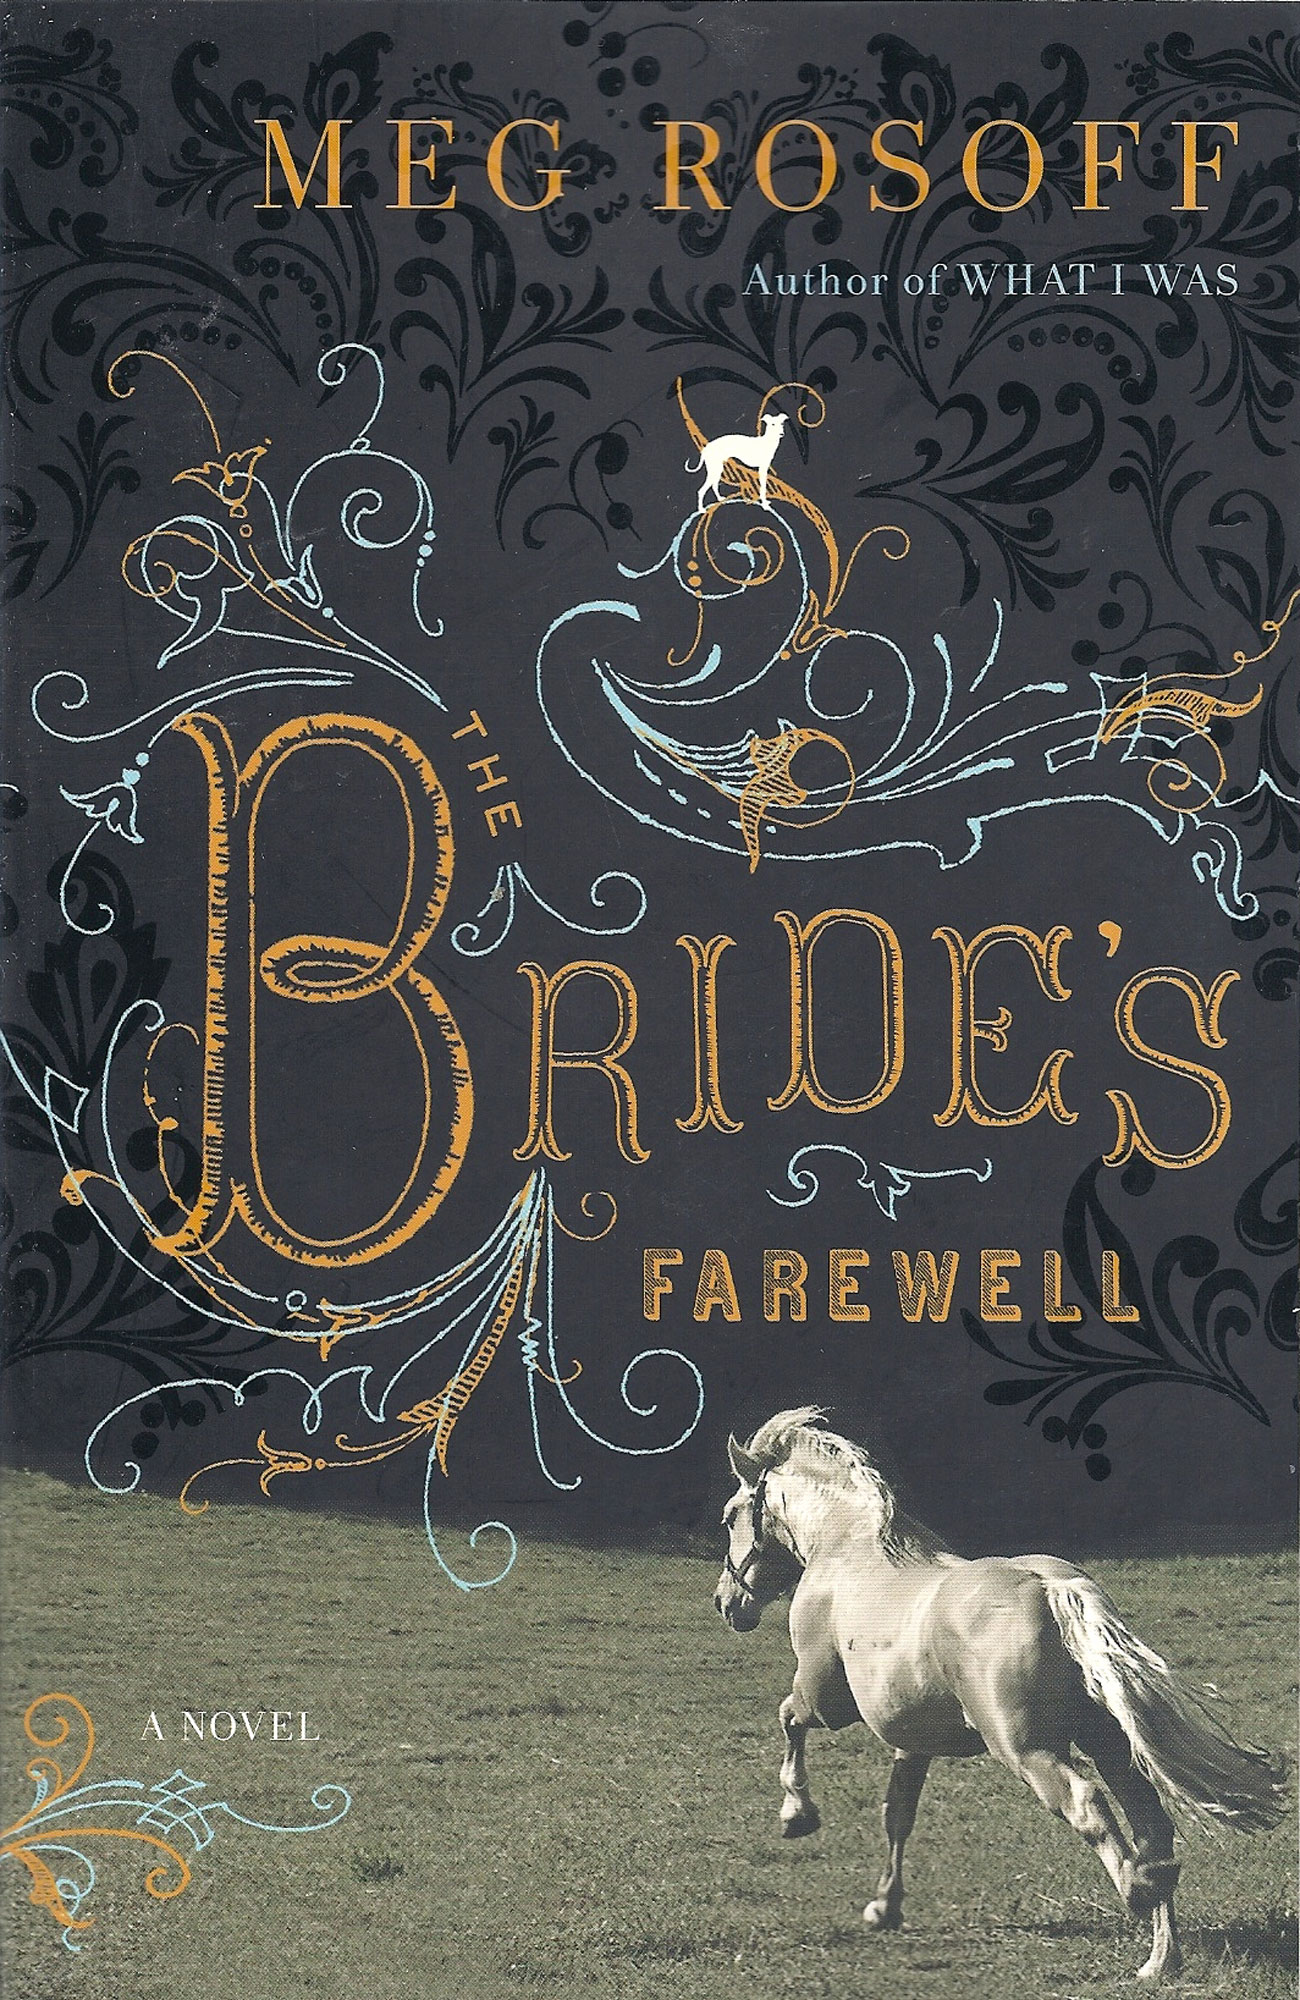 Meg-Rosoff---The-Brides-Farewell-4.jpg